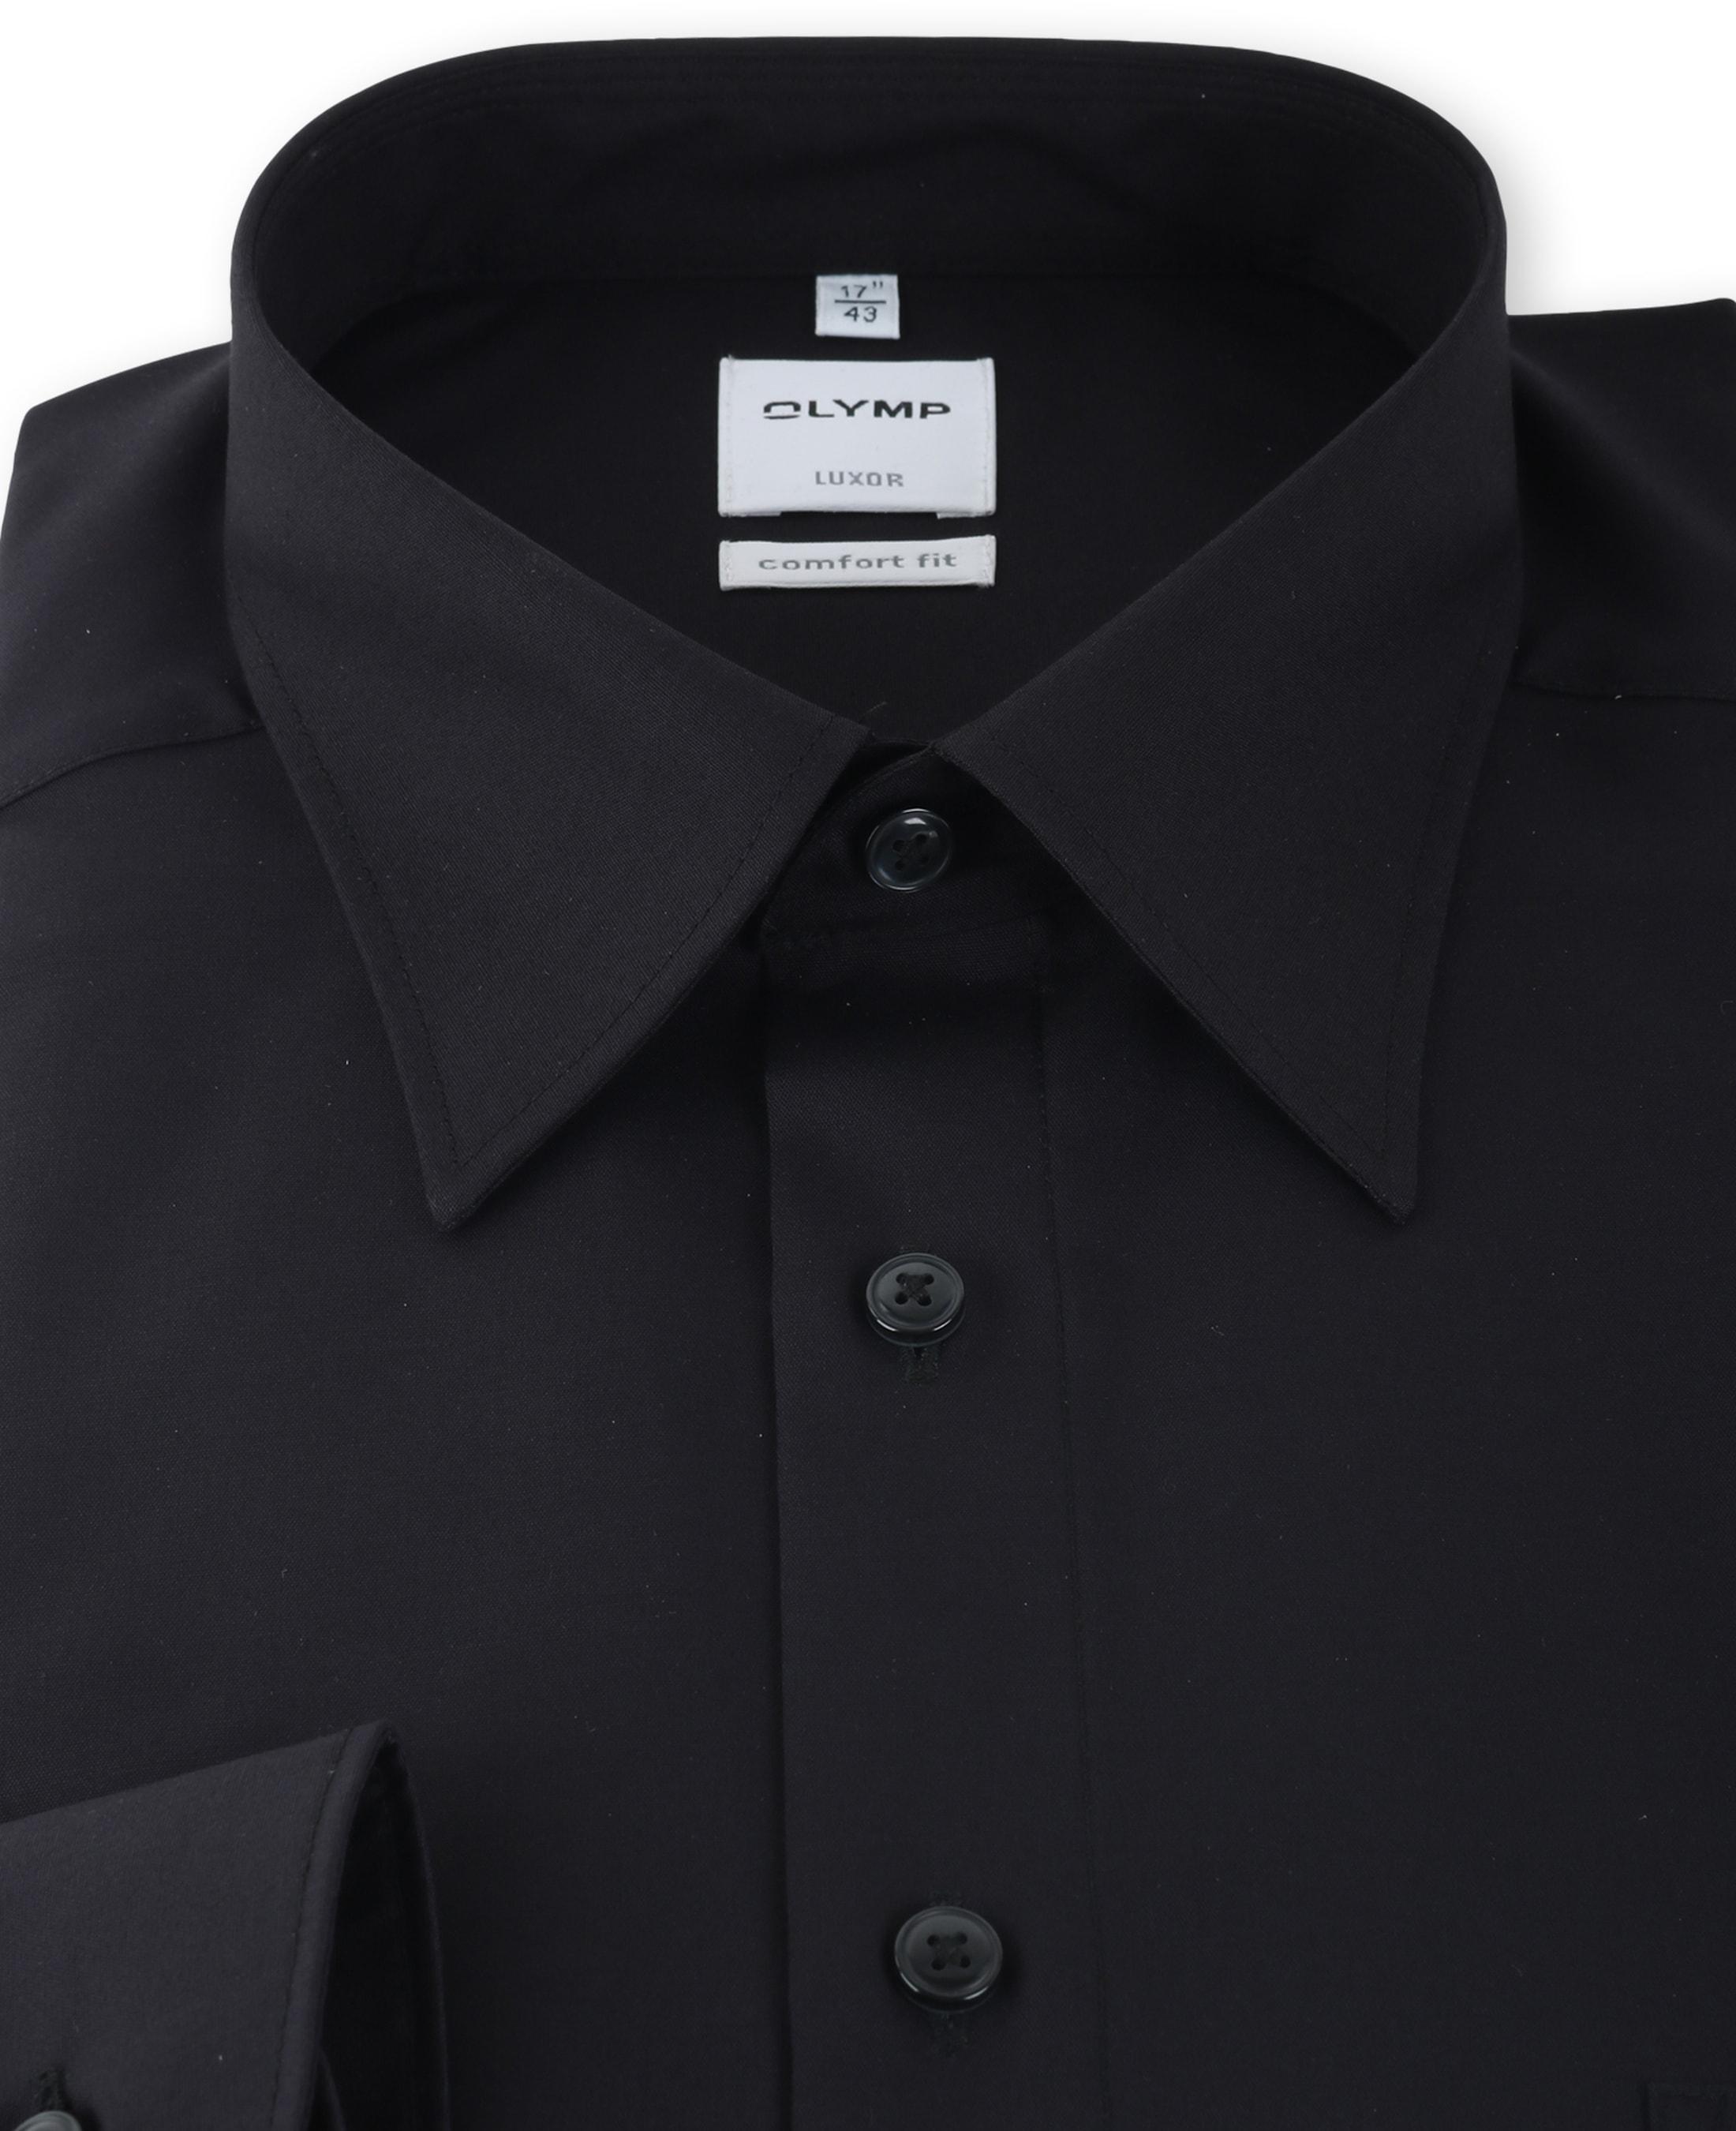 OLYMP Luxor Shirt Zwart Comfort Fit foto 1